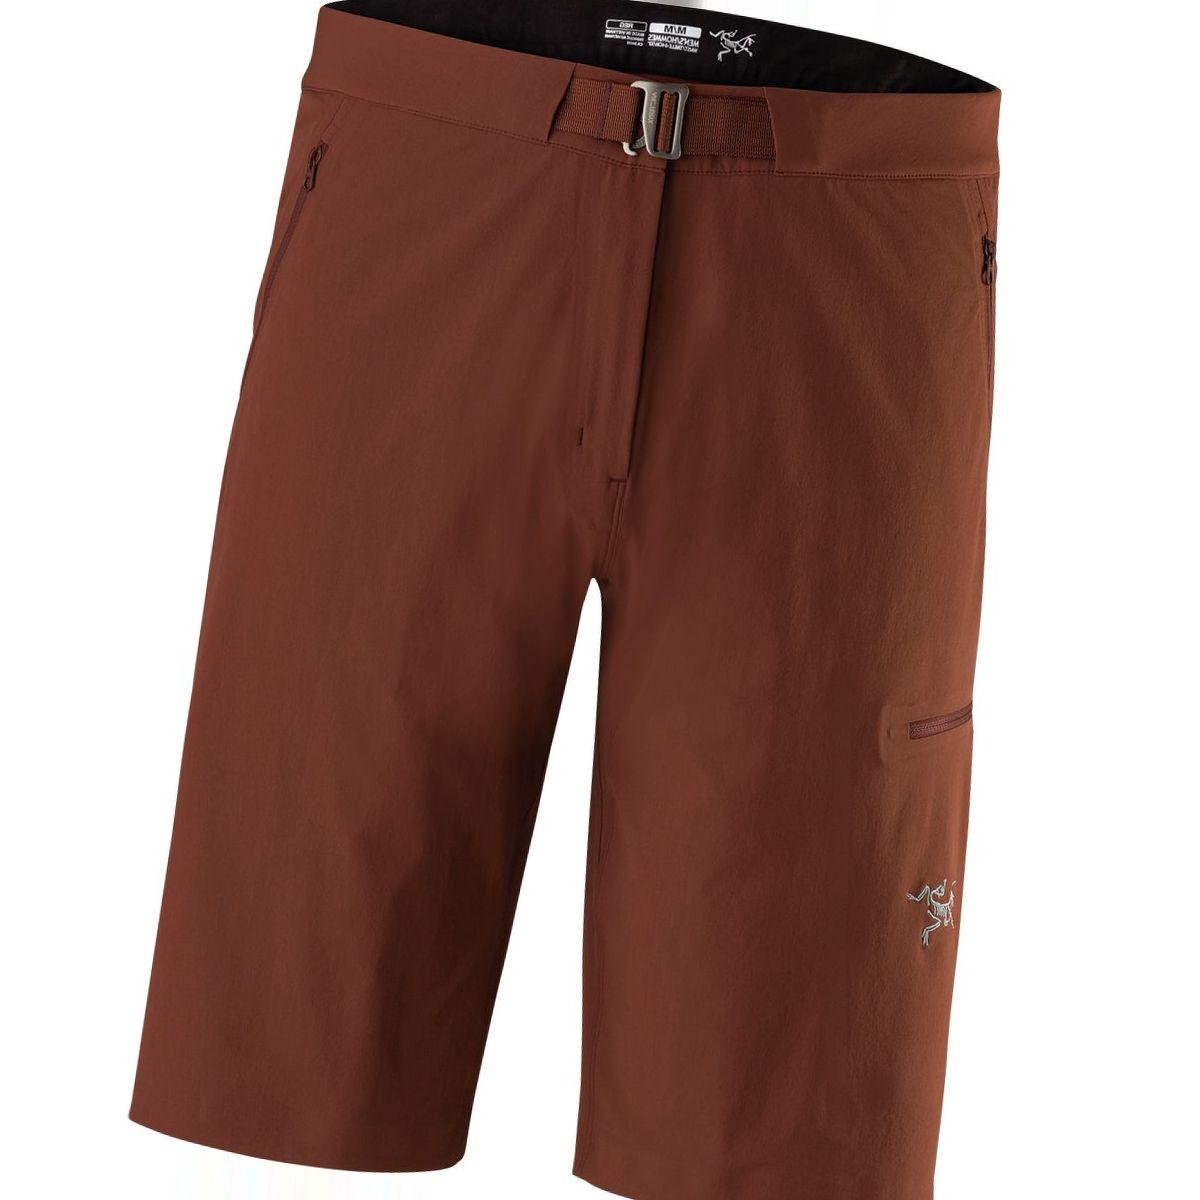 Arc'teryx Gamma LT Short - Men's